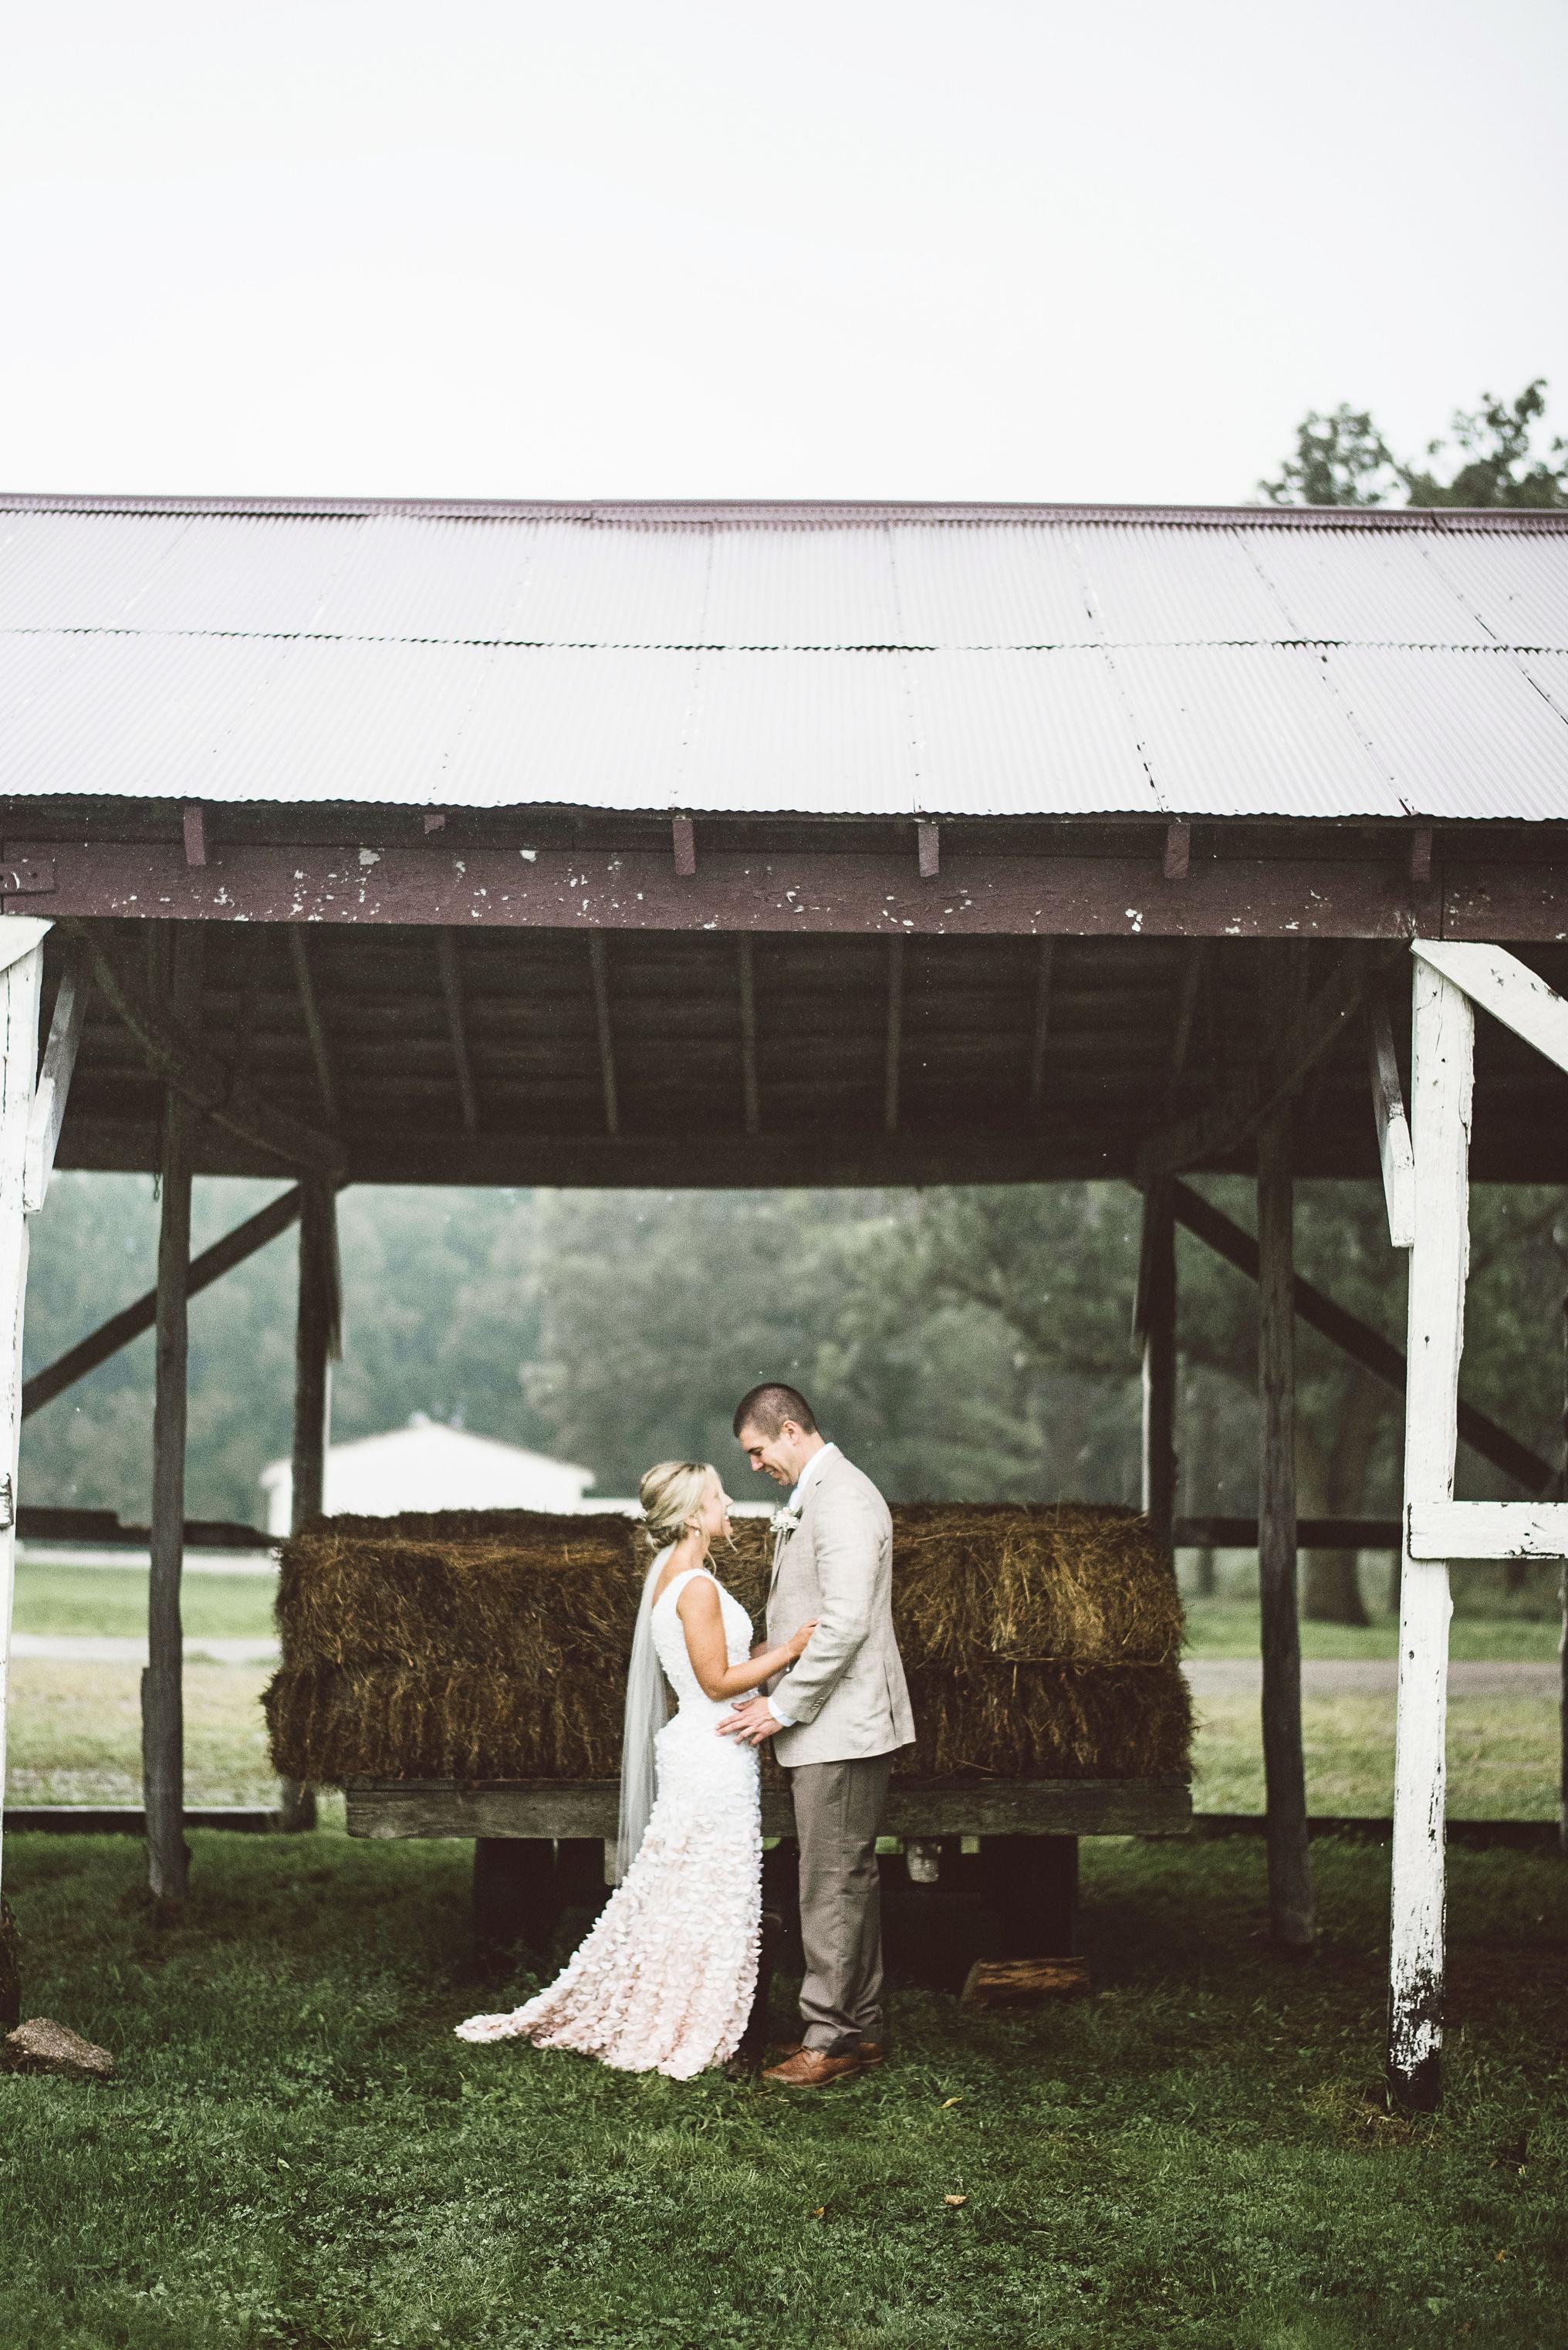 best_wedding_photography_2017_by_lucas_botz_photography_102.jpg